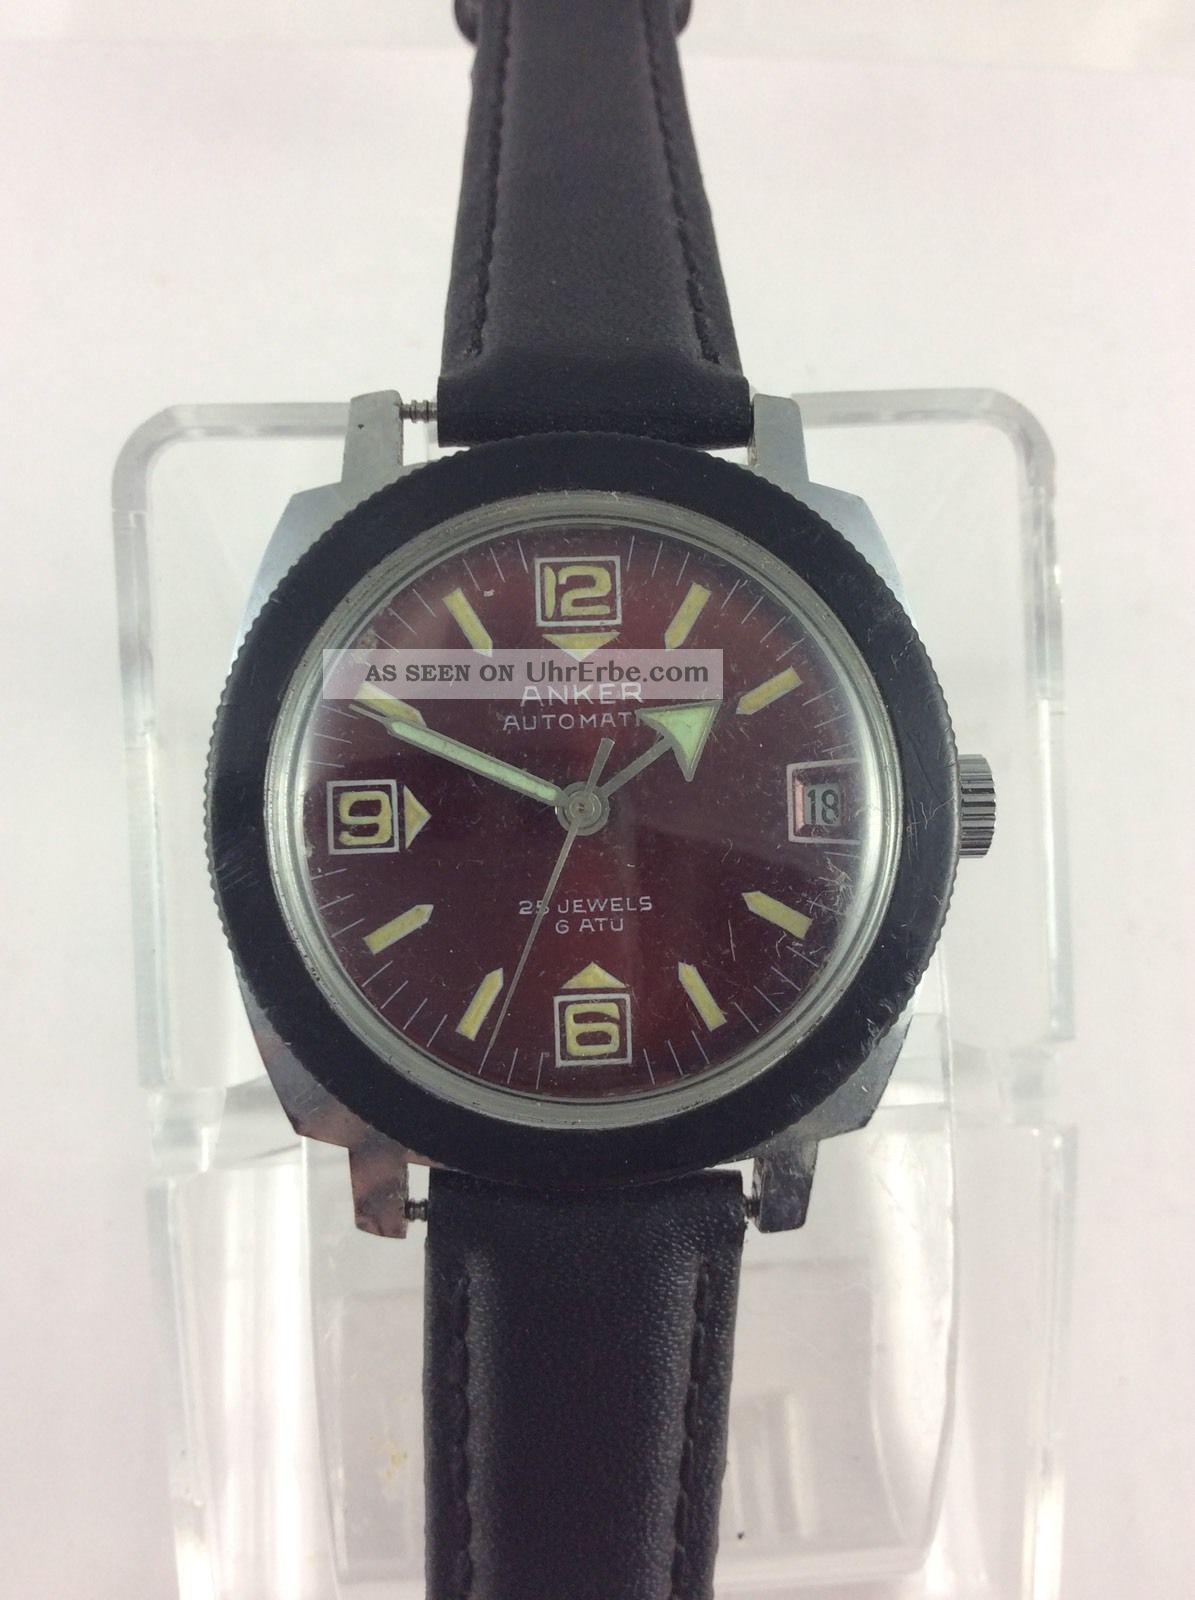 Anker Automatic Taucher Diver Top Selten RaritÄt Rotes Ziffernblatt 6 Atu Rare Armbanduhren Bild